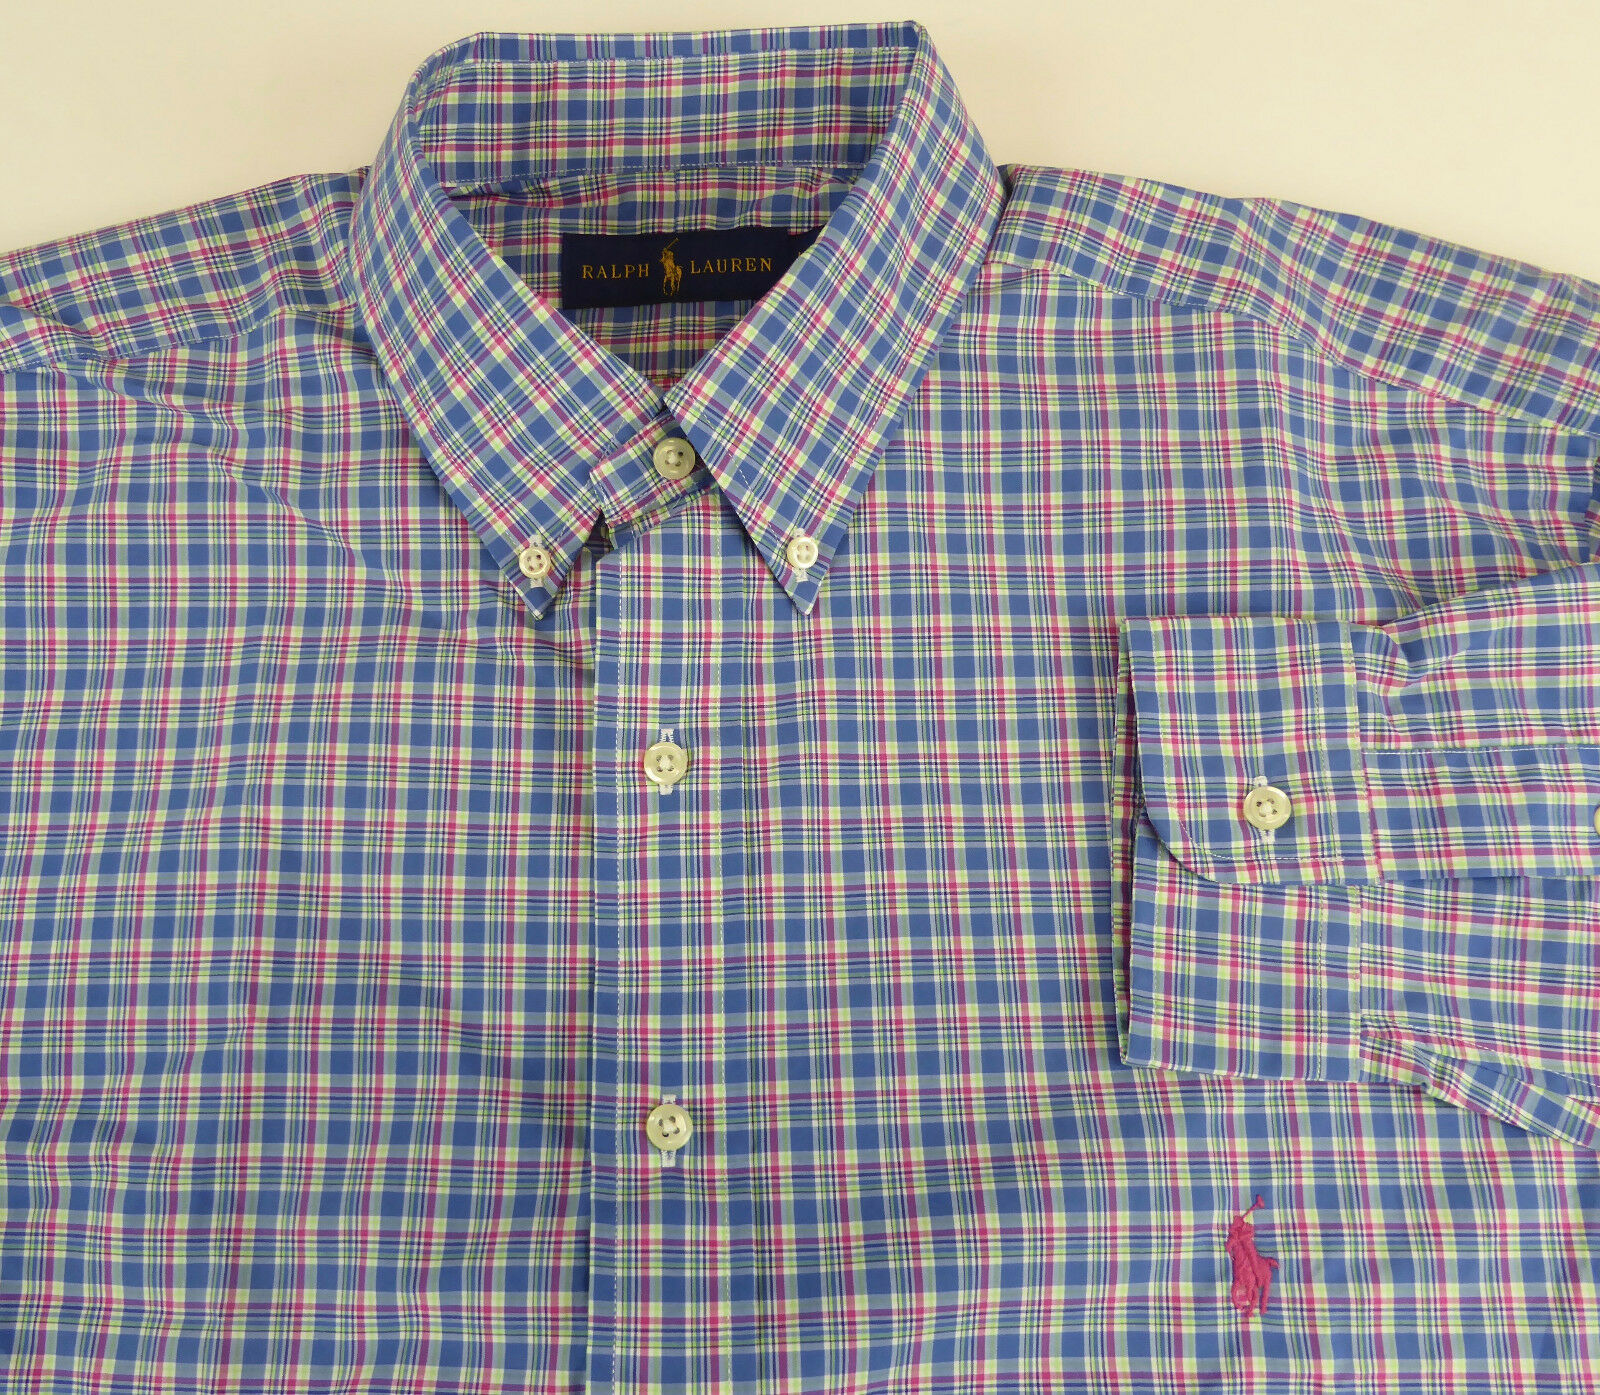 Polo Ralph Lauren Long Sleeve Poplin Cotton Shirt Plaid NWT w  Pink Pony  LT